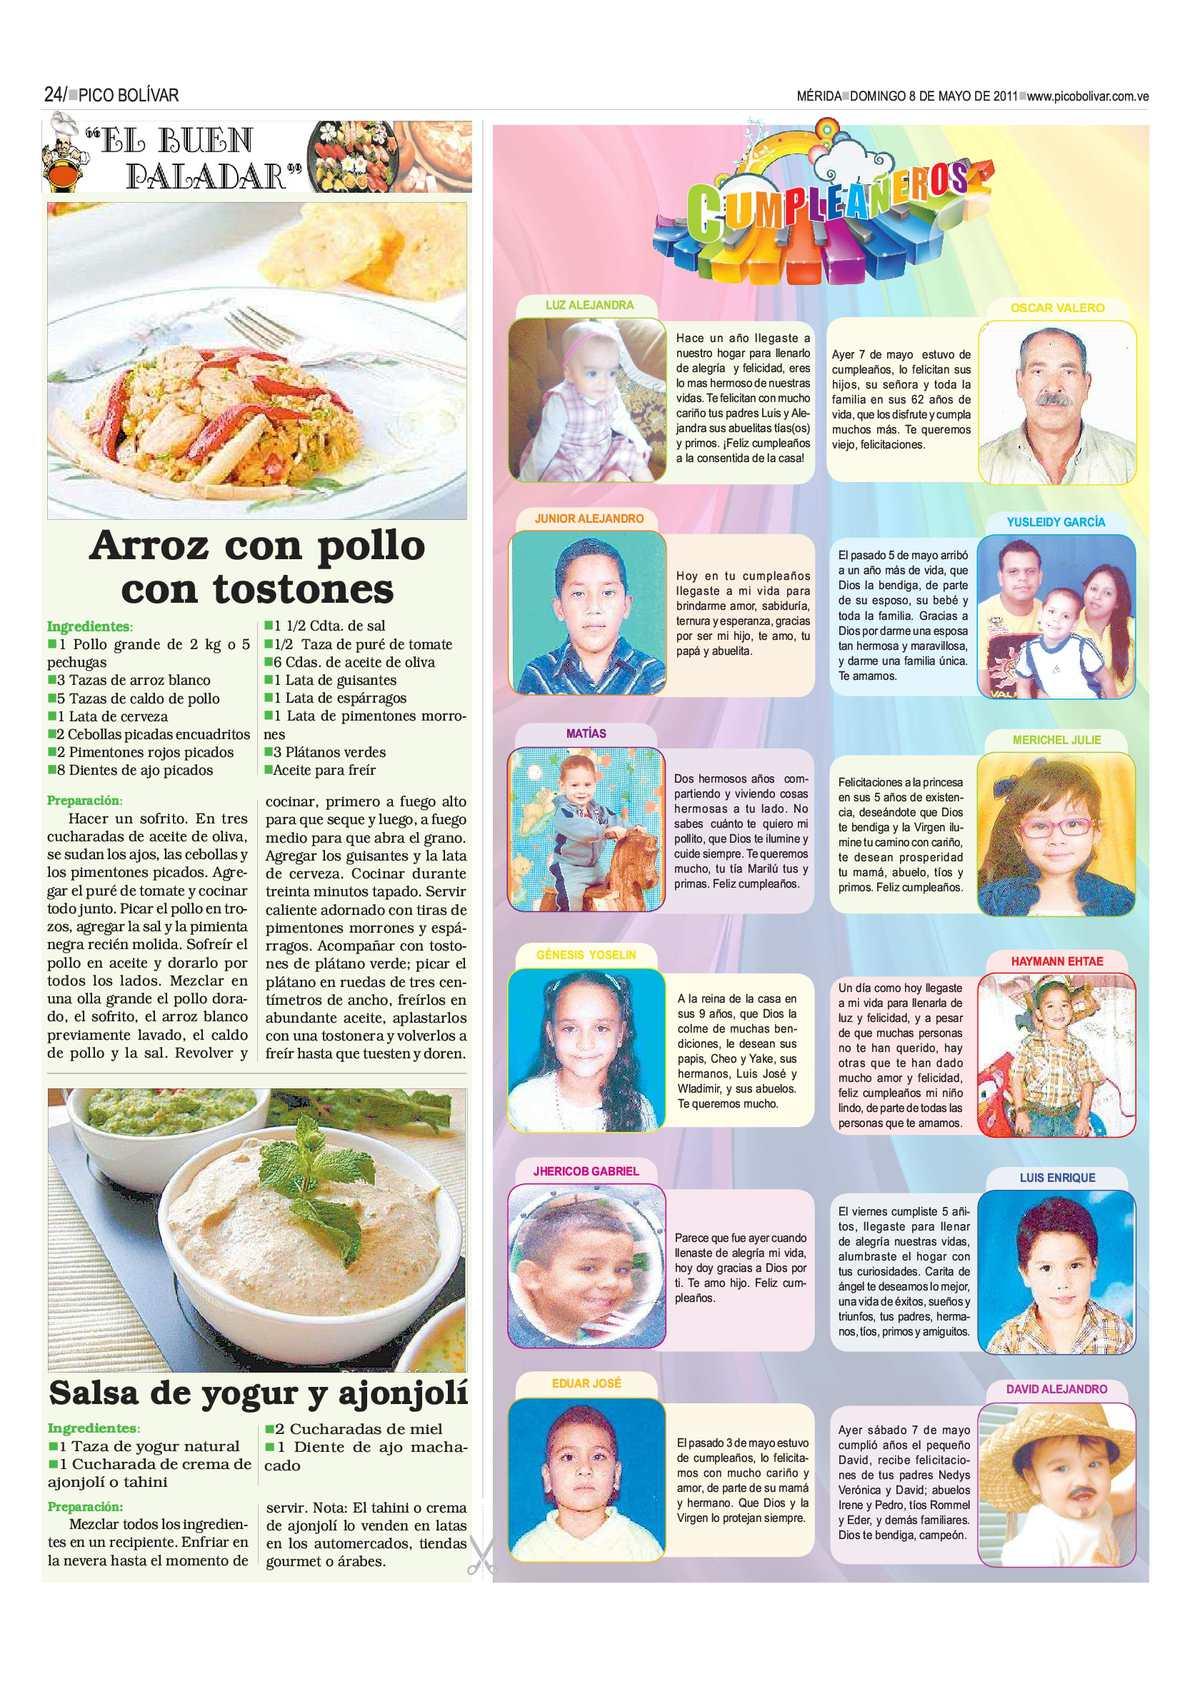 Periódico Pico Bolívar P184 Calameo Downloader